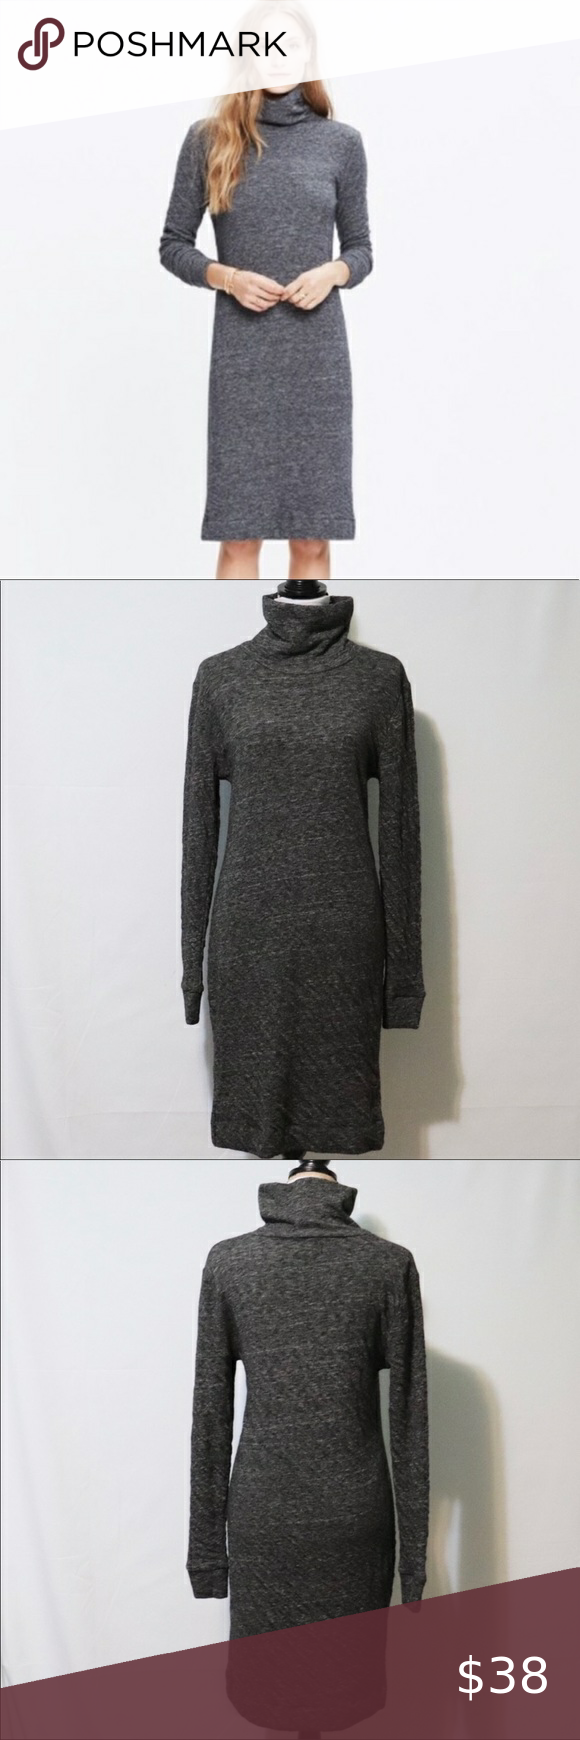 Banana Republic Marbled Sweater Dress Clothes Design Sweater Dress Dresses